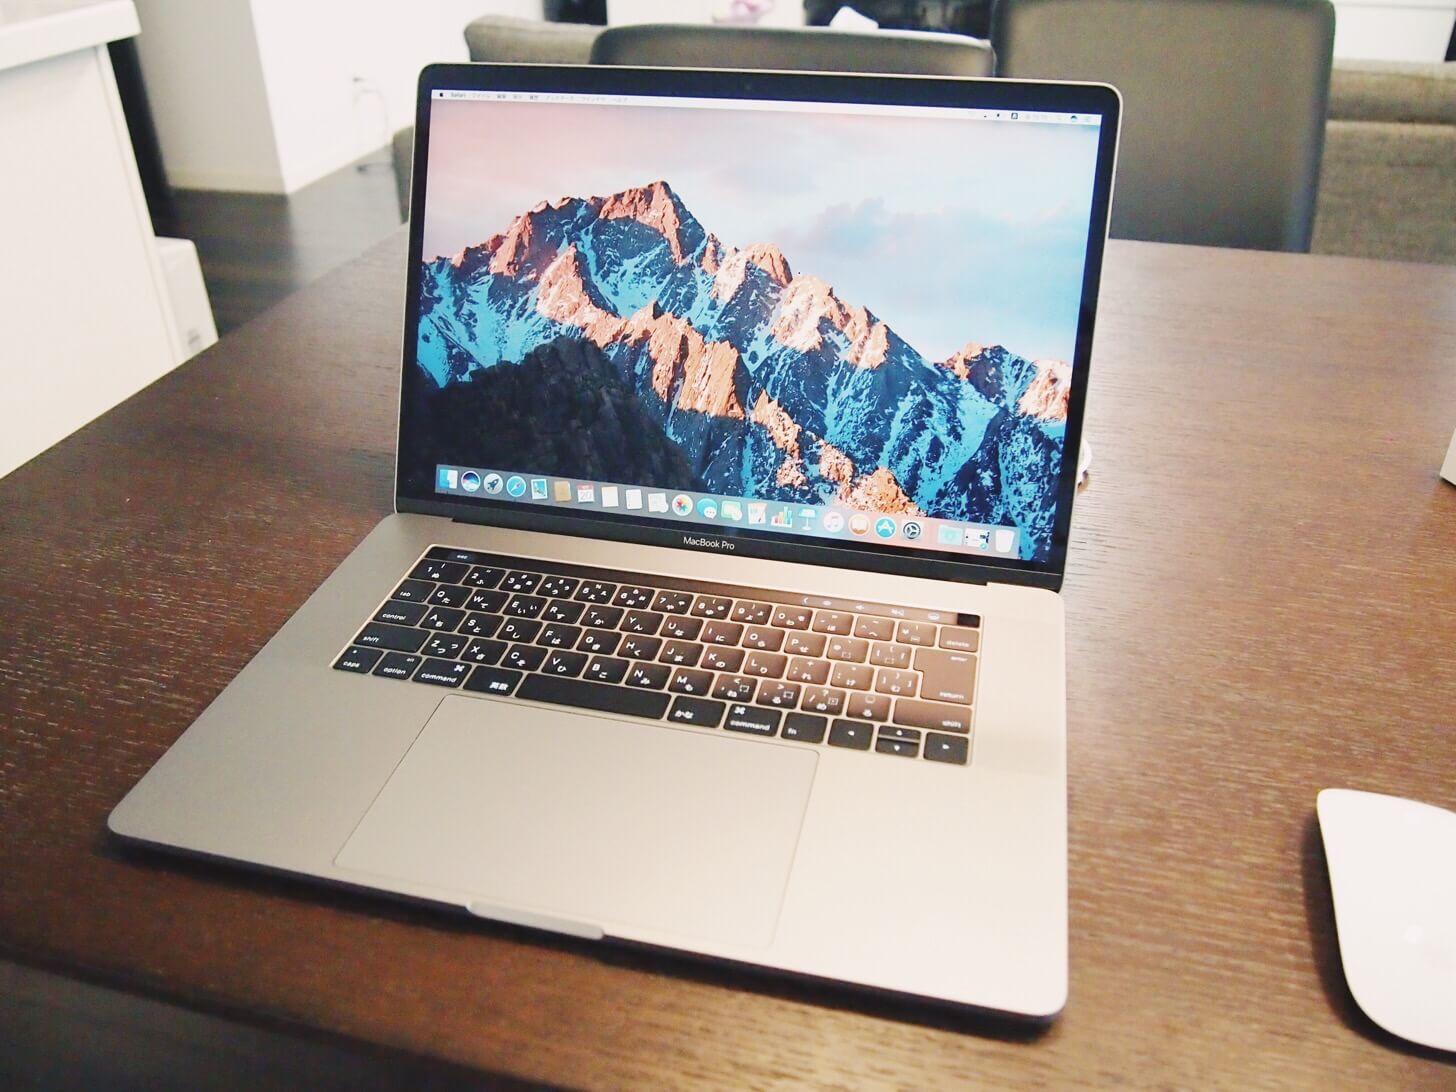 macbookpro2016-15inch